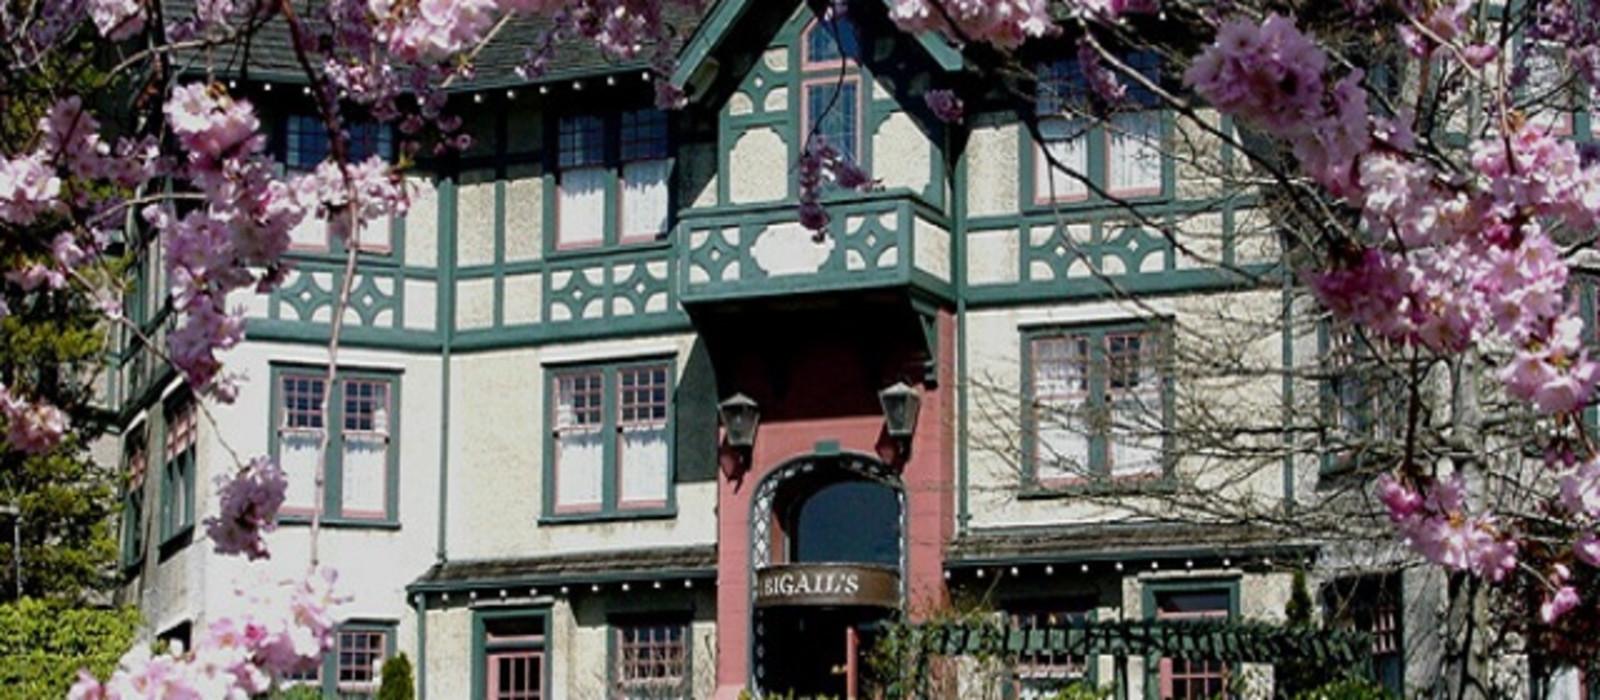 Hotel Abigail's  Canada